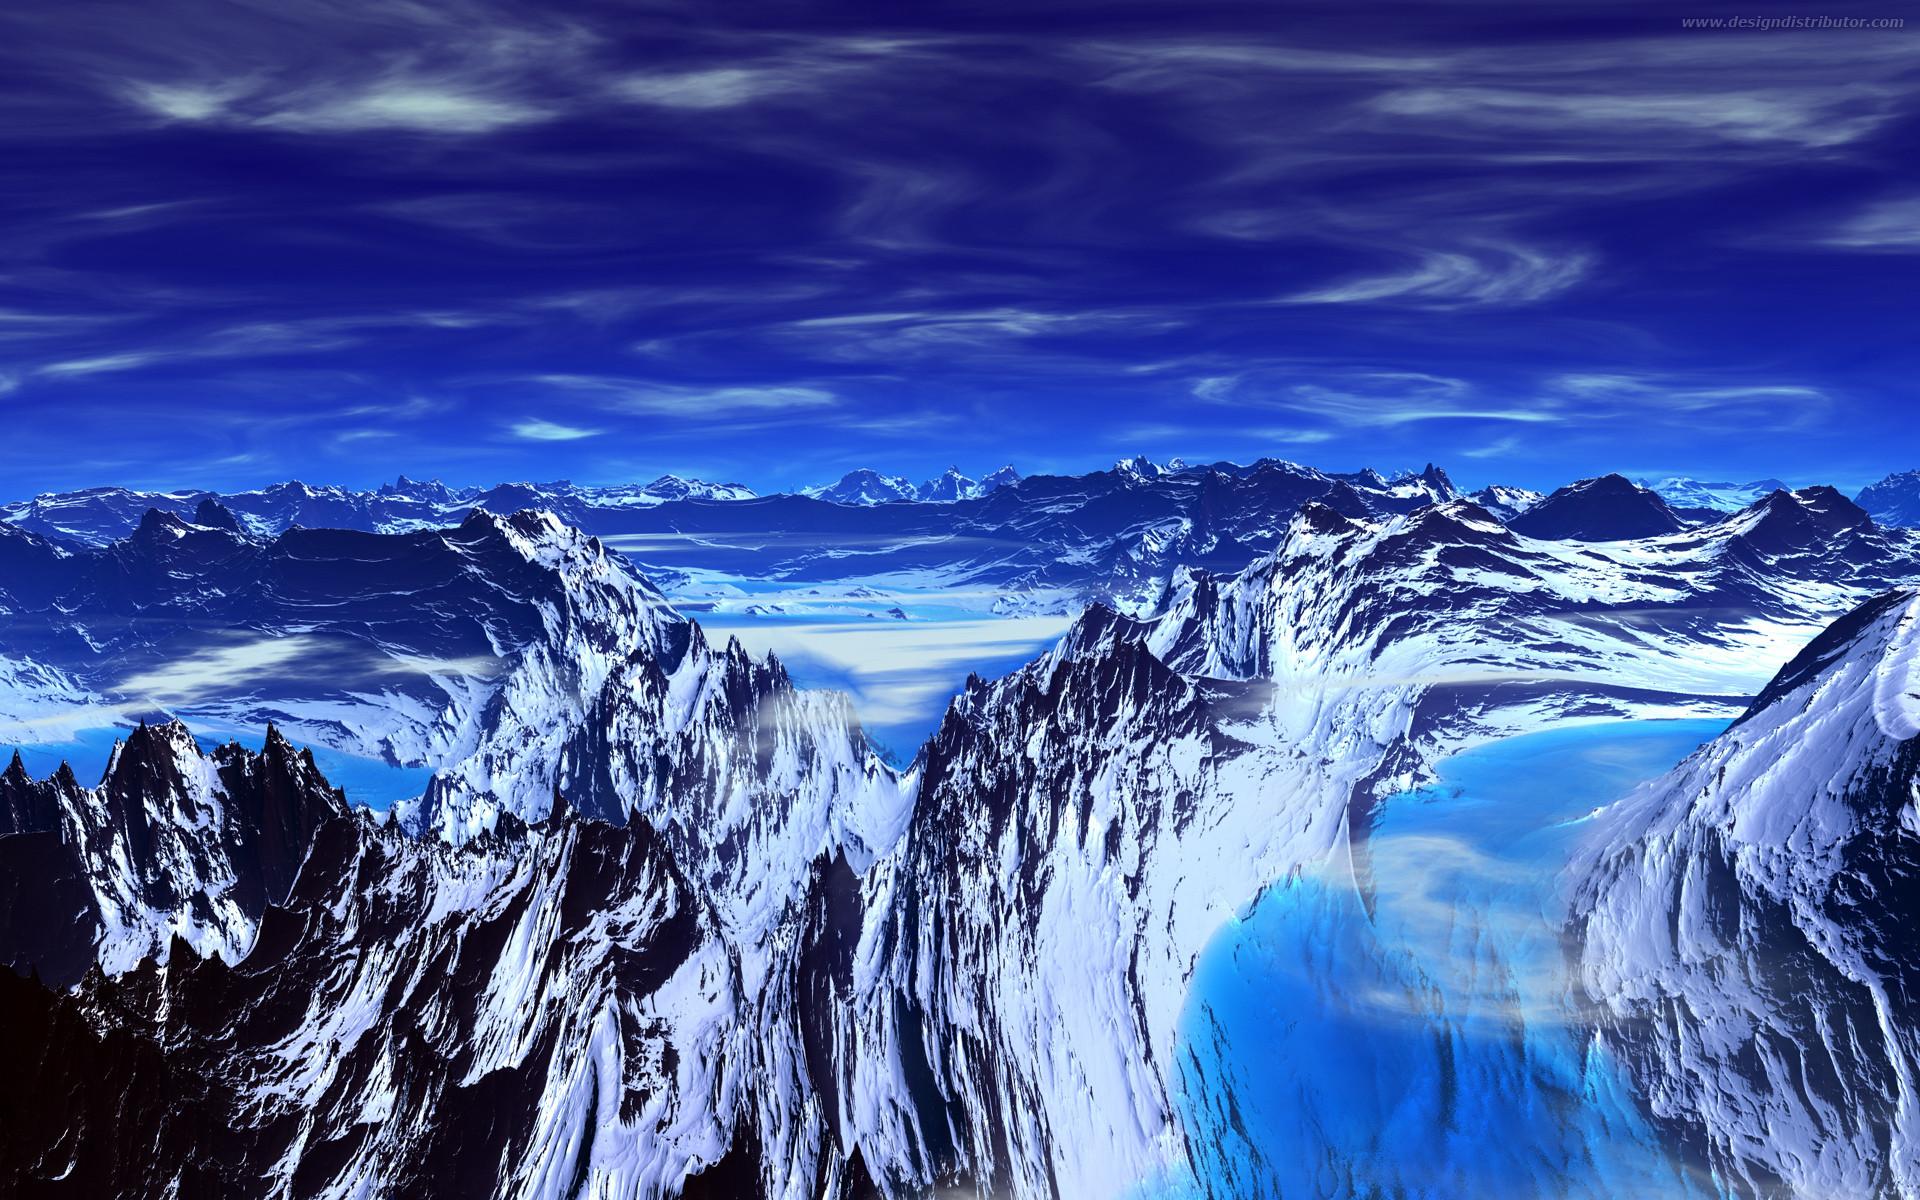 HD wallpaper download | Nature Full HD Wallpaper – National Geographic  Wallpaper (7822846 .